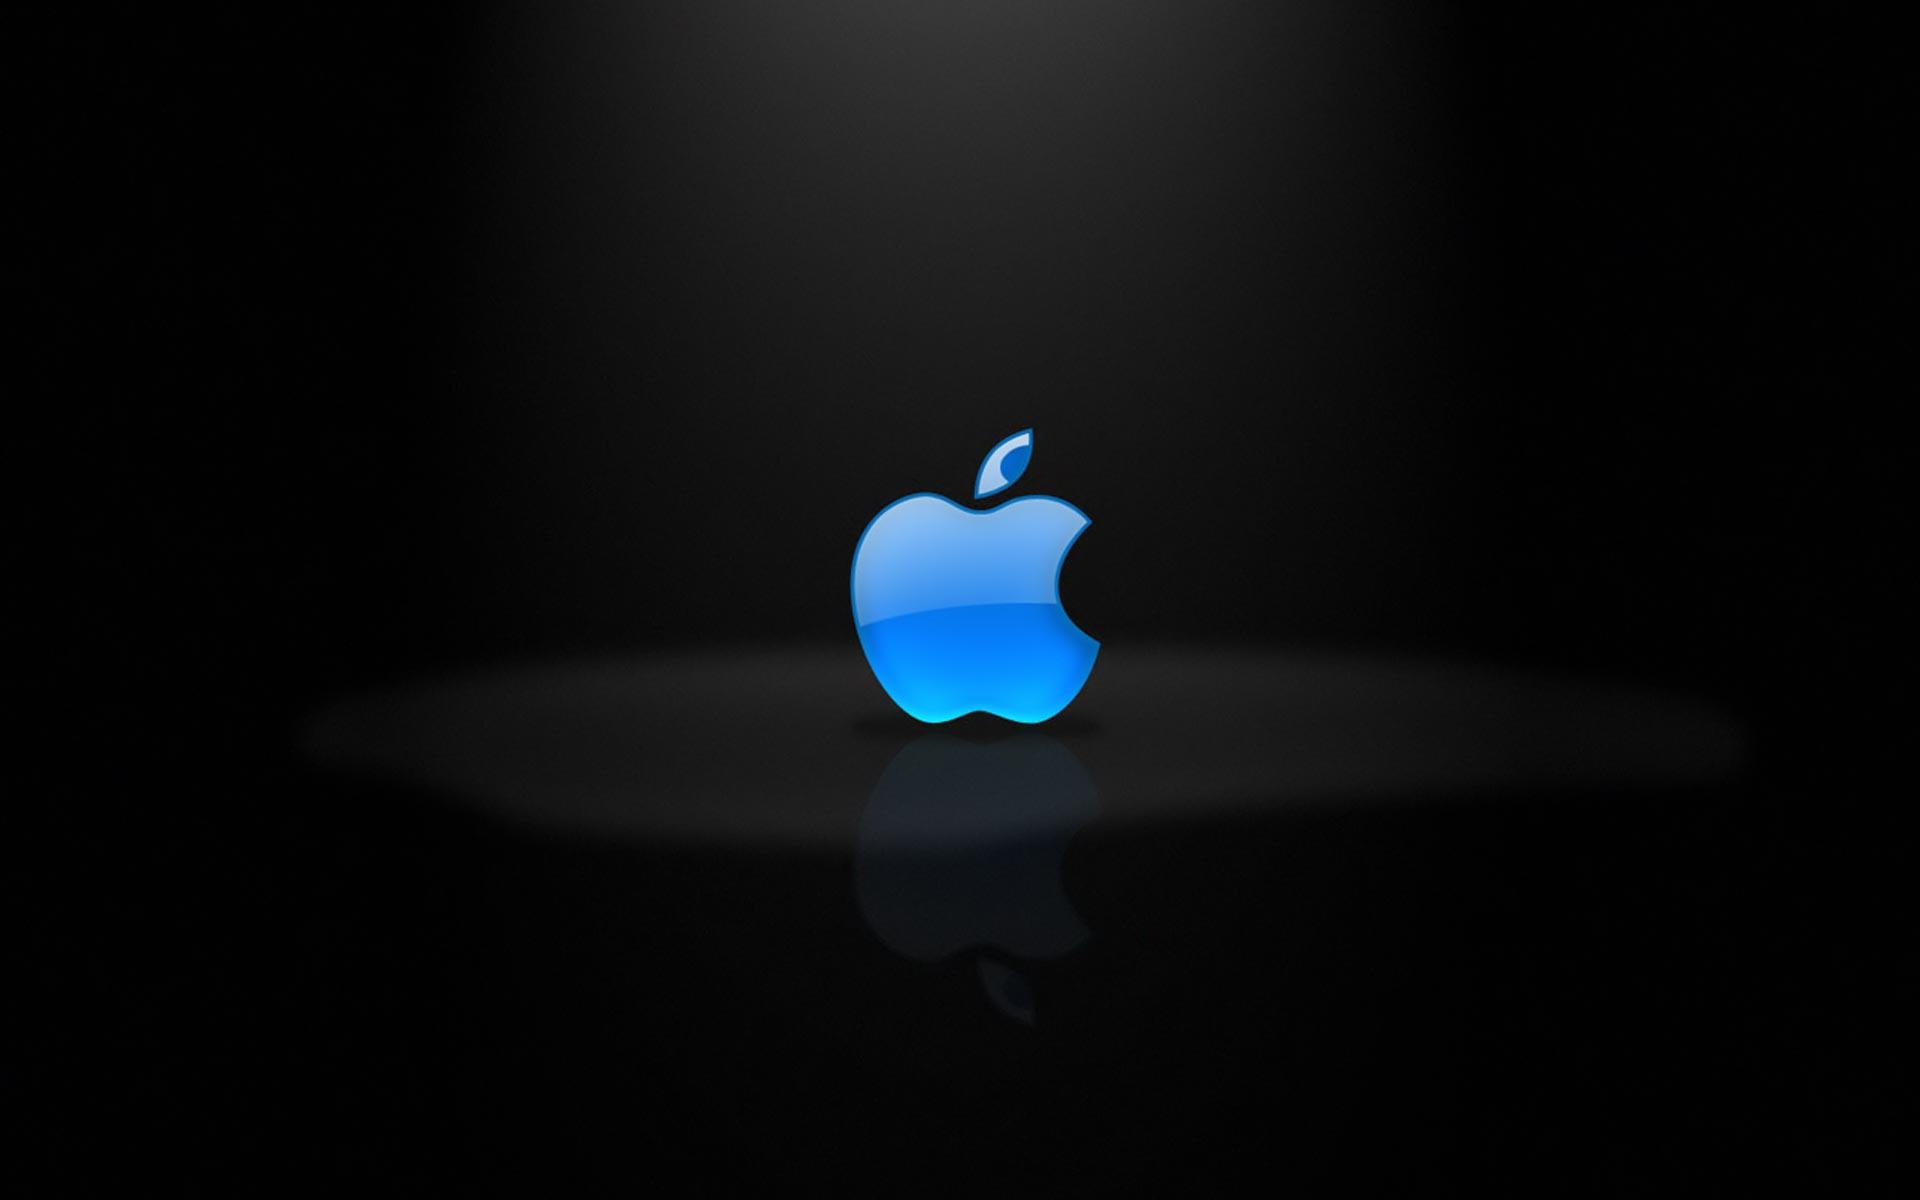 Mac Desktop Backgrounds | Desktop Backgrounds